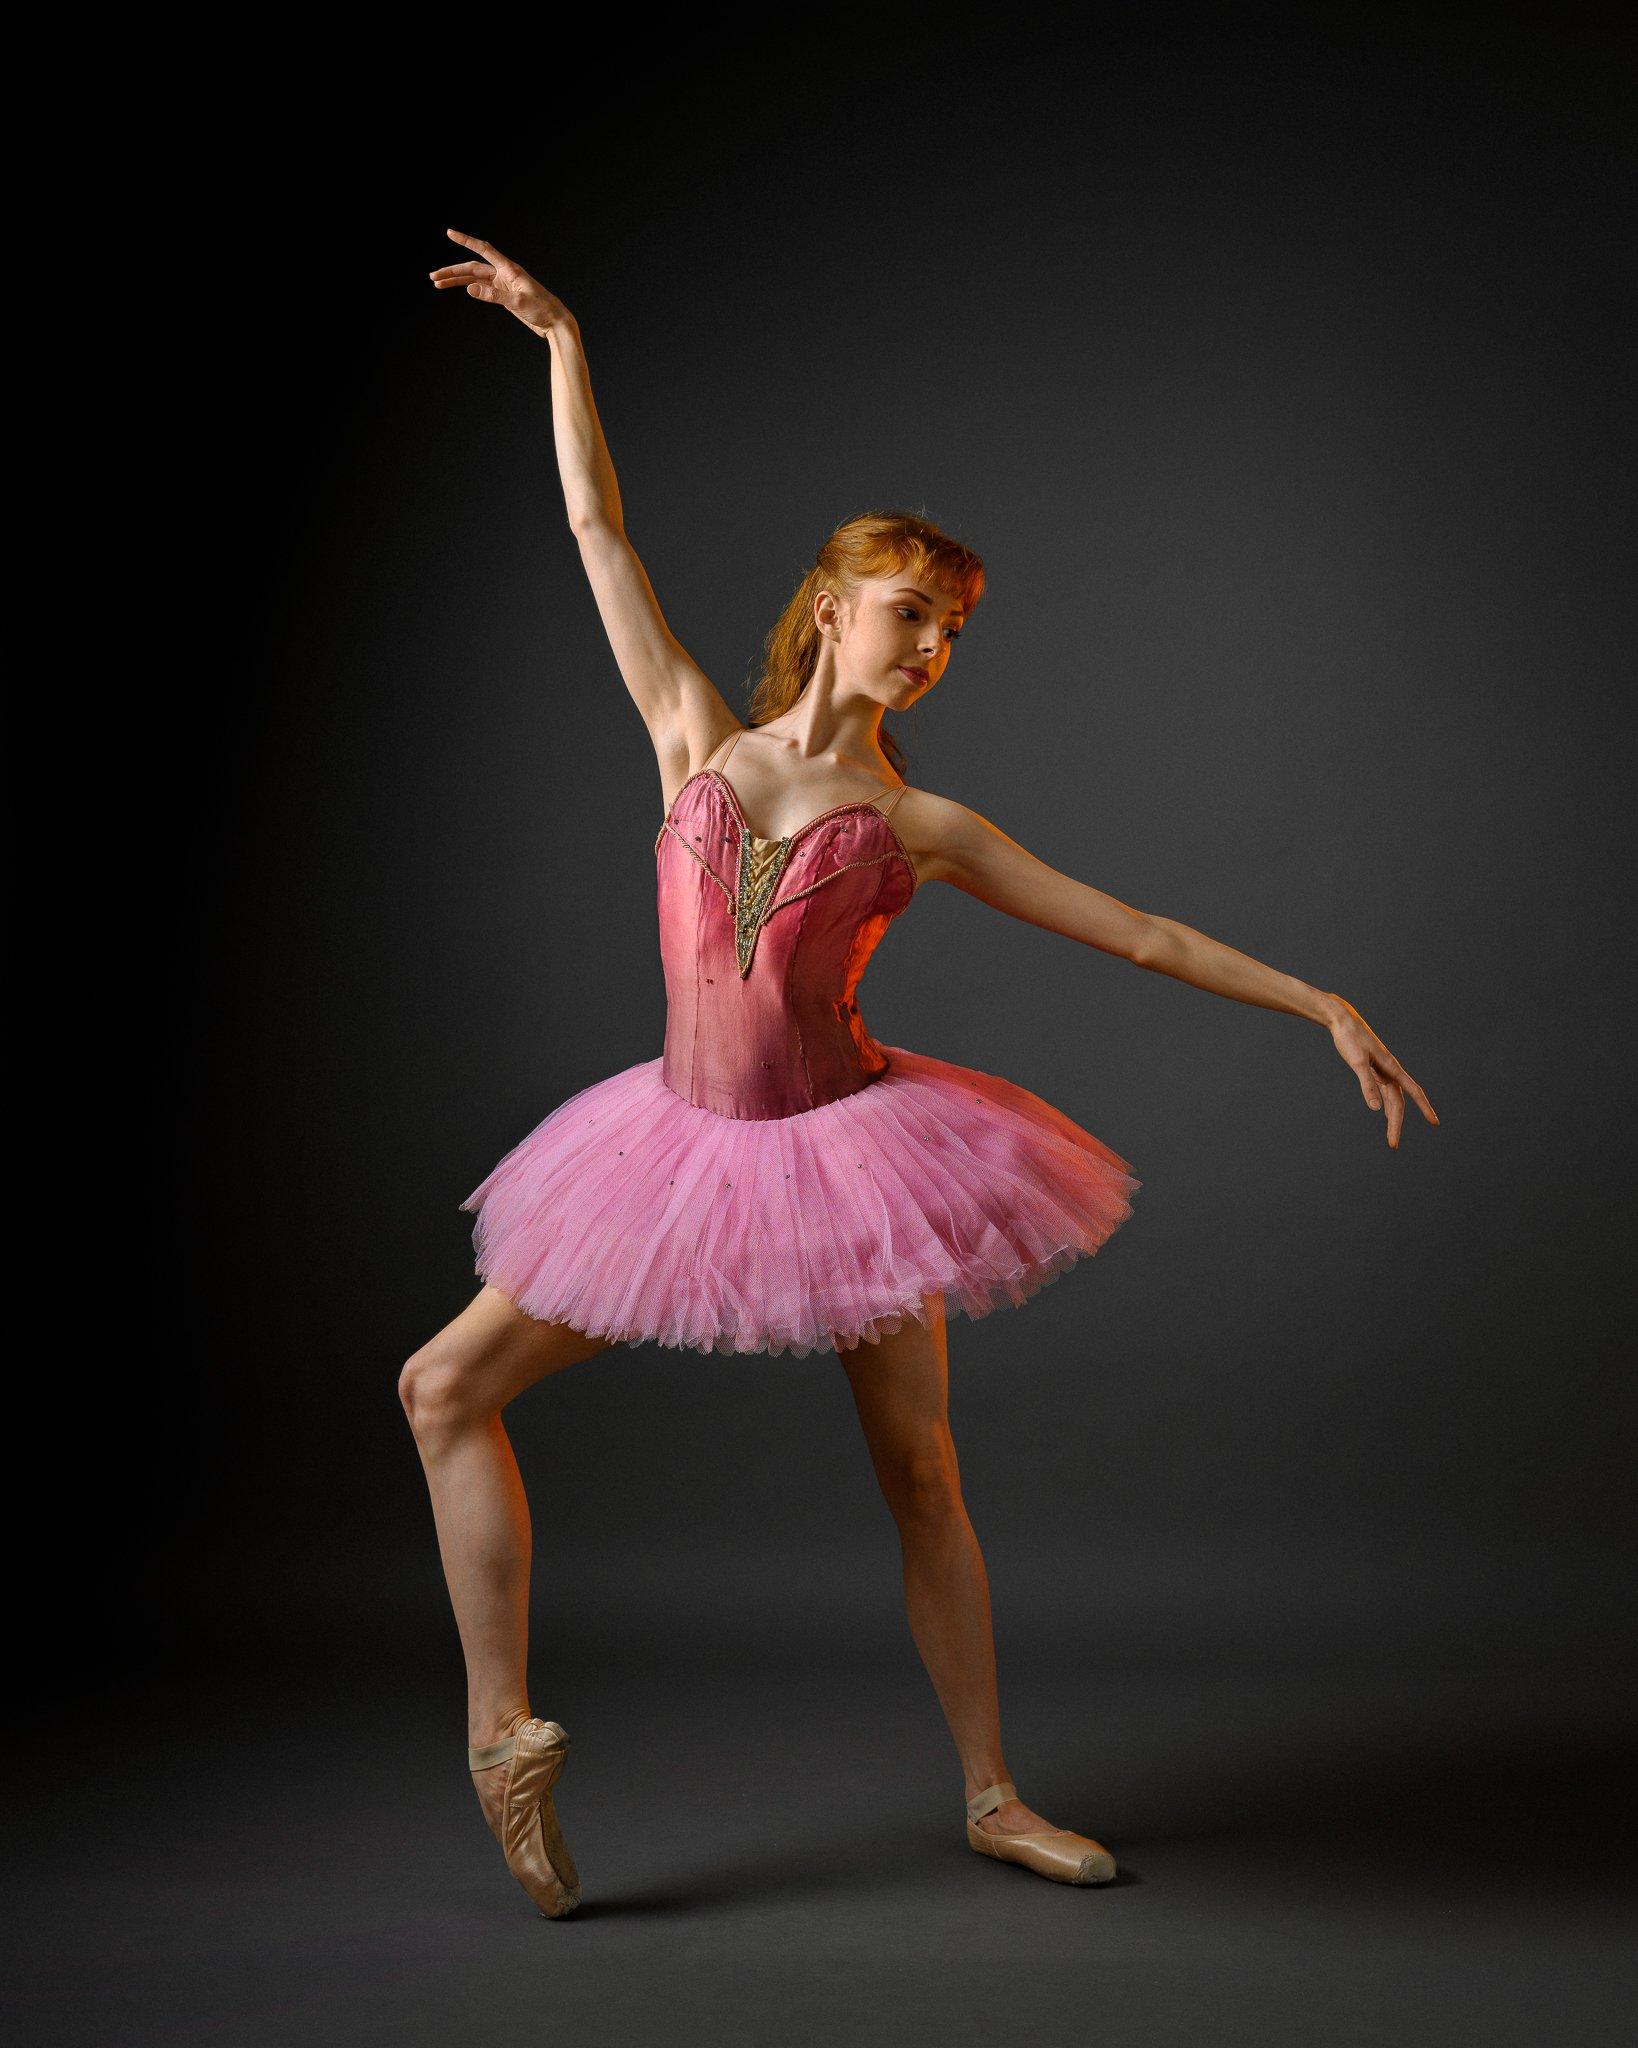 girl, female, dancer, ballerina, model, studio, portrait, Saulius Ke